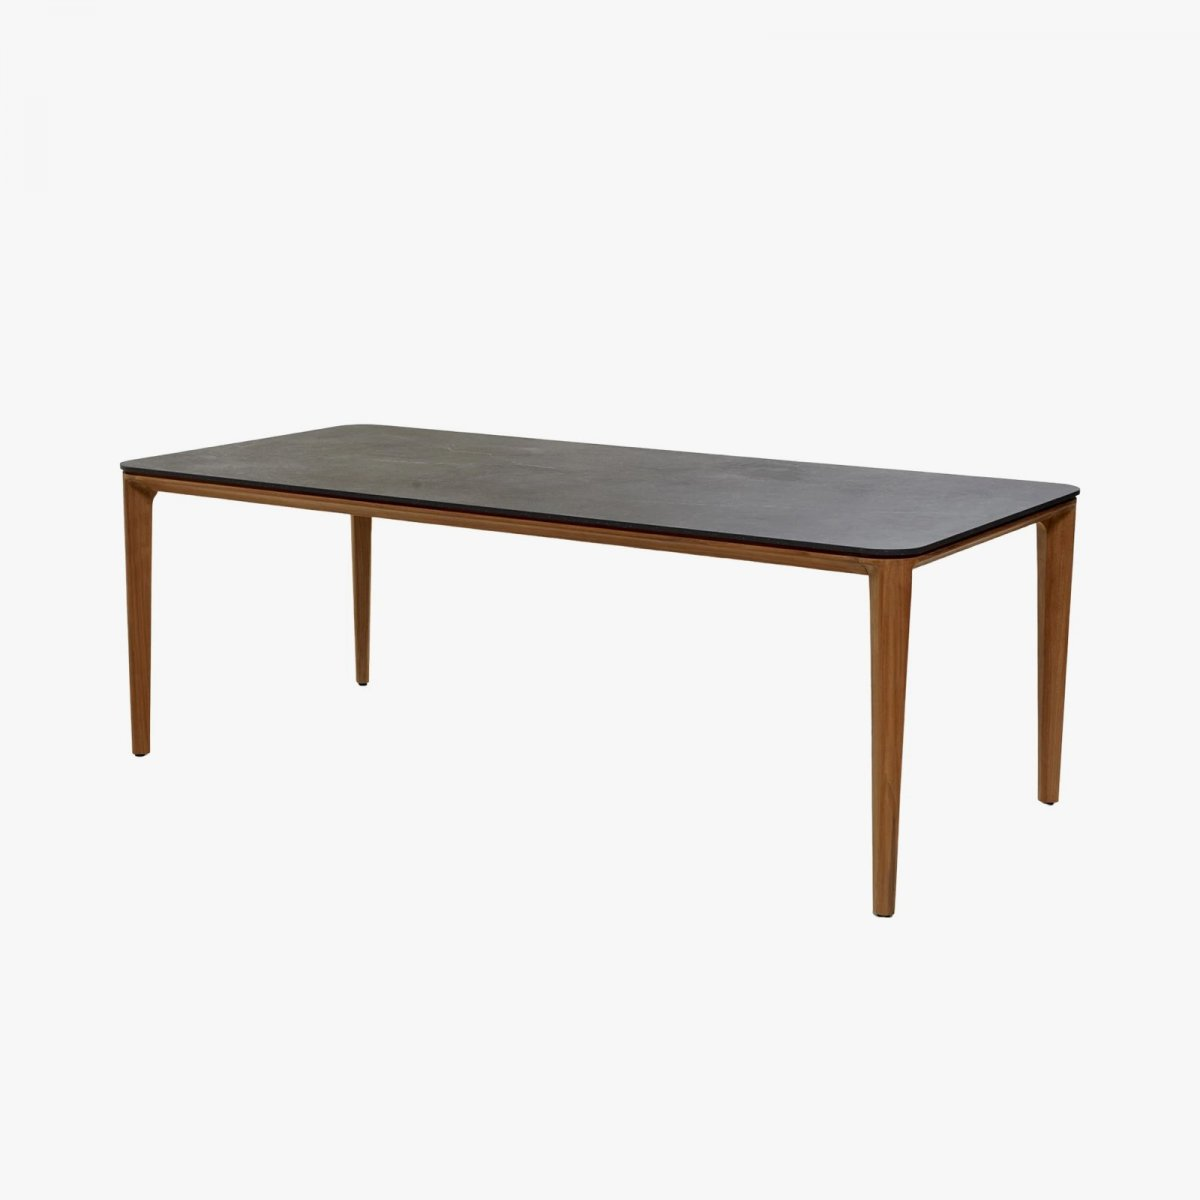 Aspect Dining Table Base, 210 x 100 cm.